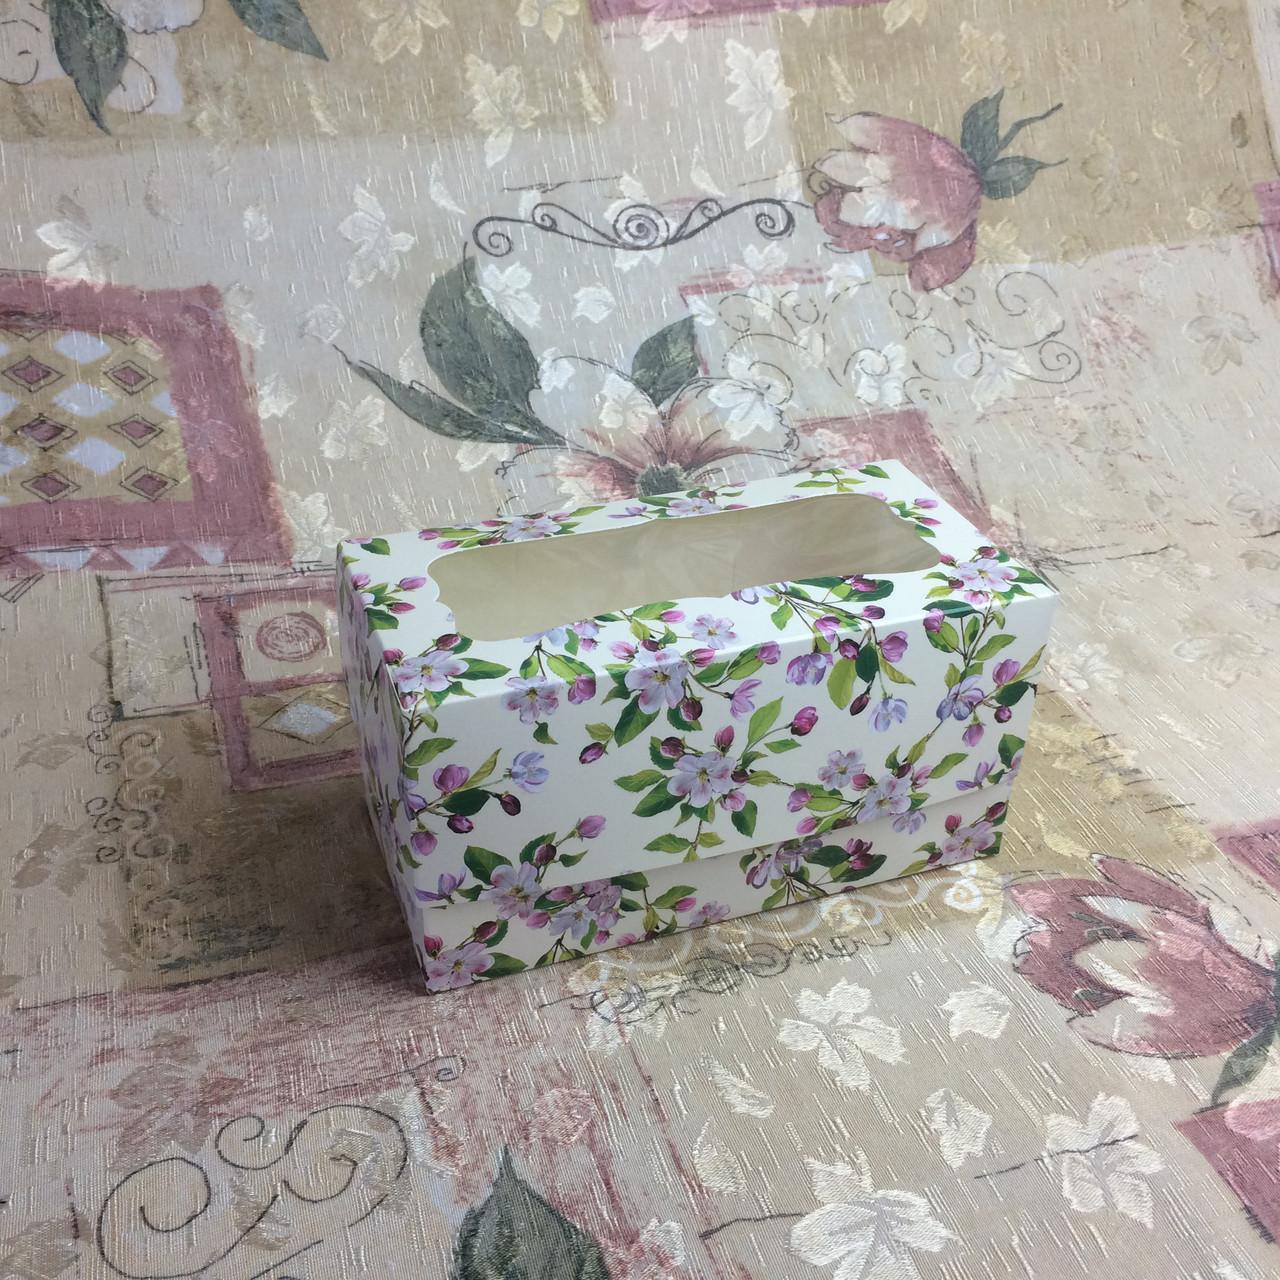 Коробка для 2-ух кексов / 170х85х90 мм / печать-Весна / окно-обычн / лк / цв